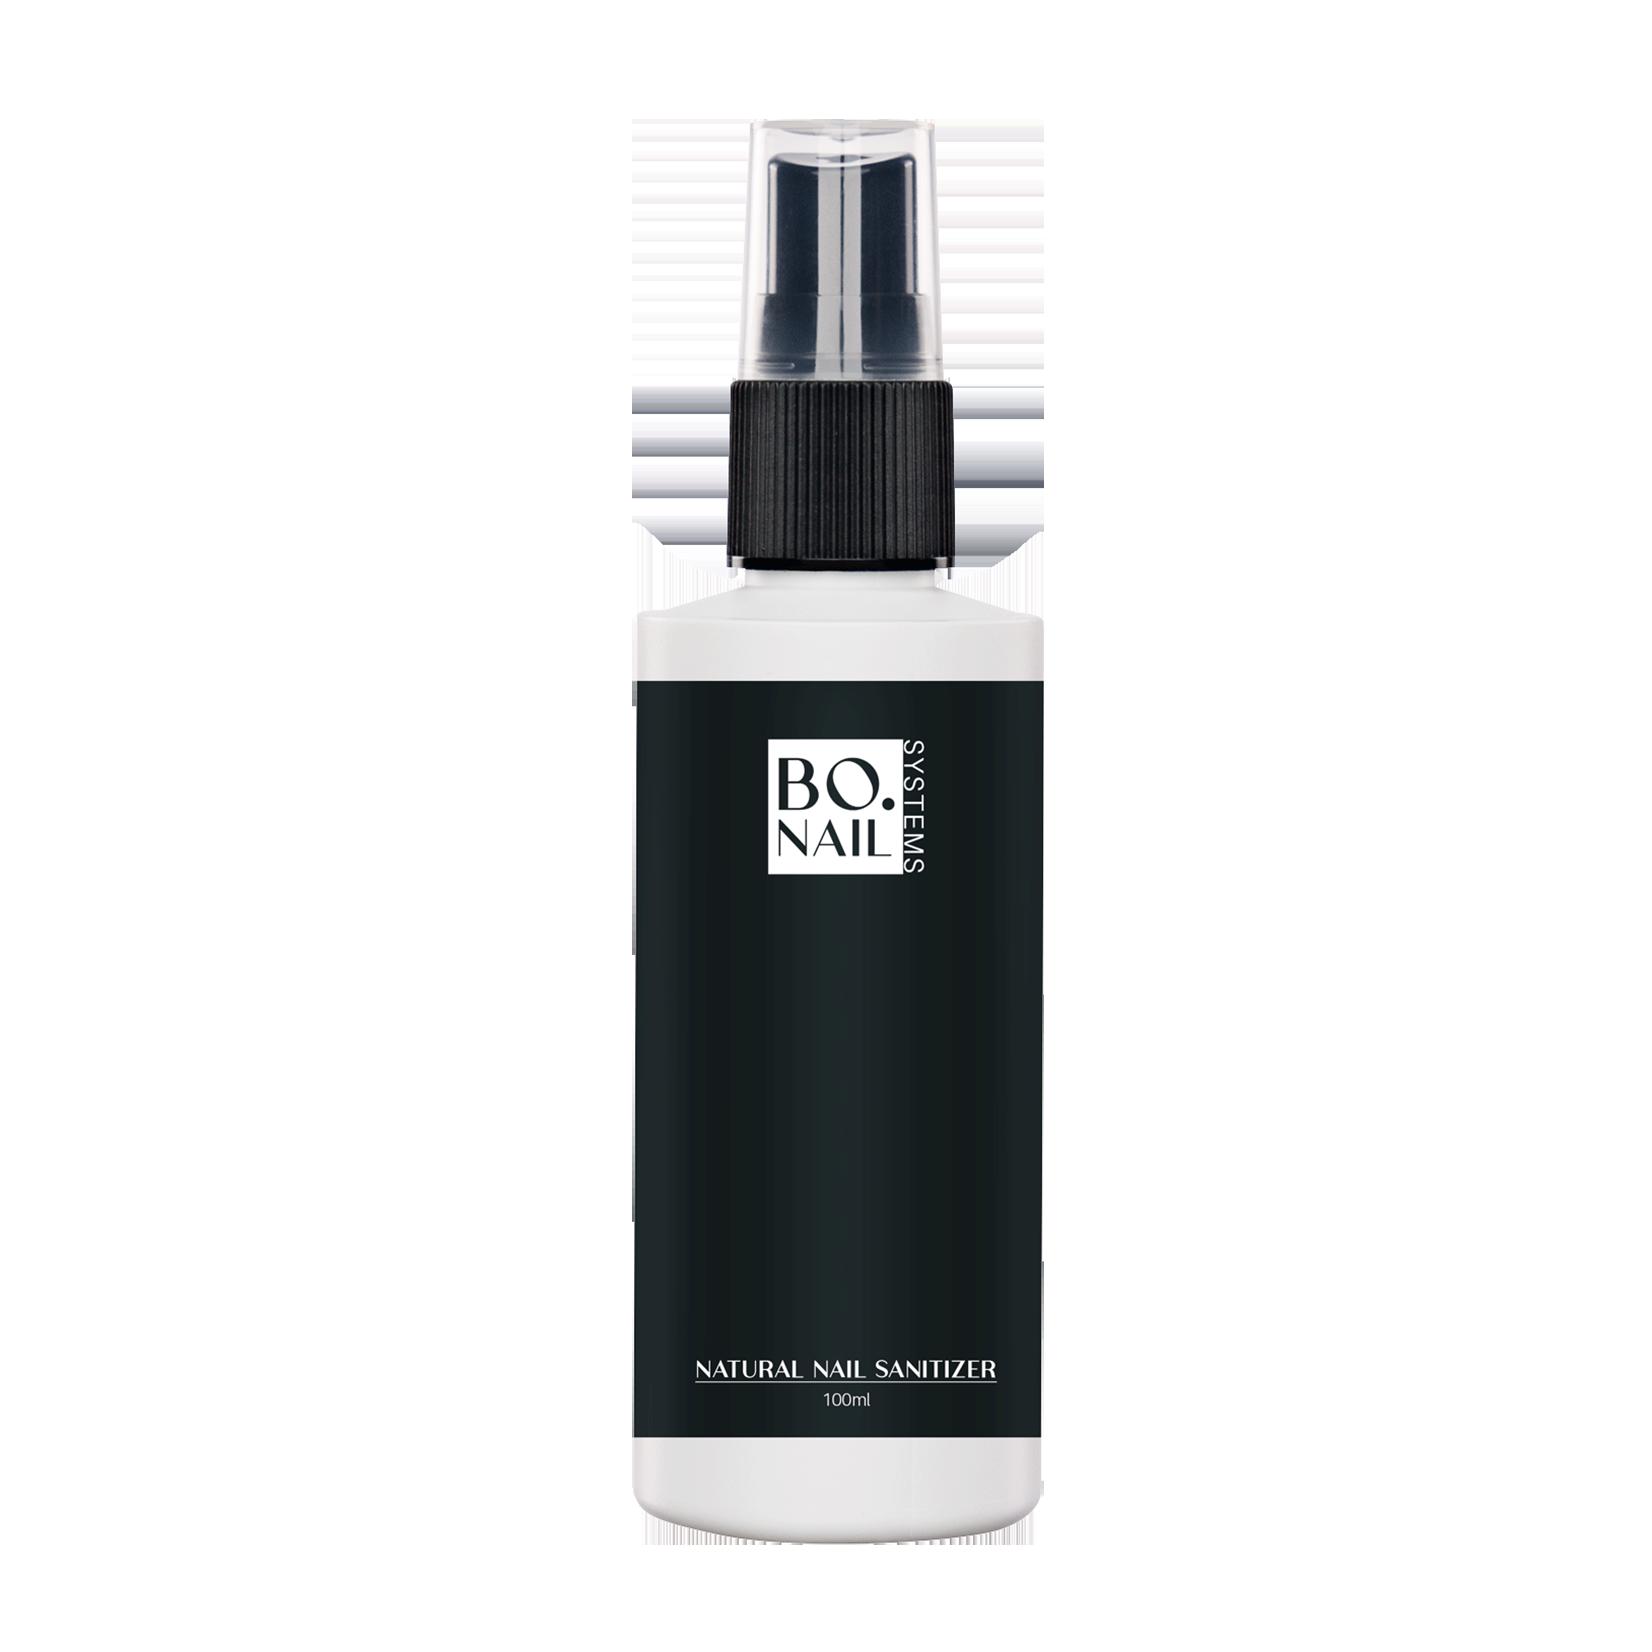 BO. Natural Nail Sanitizer (100ml)2